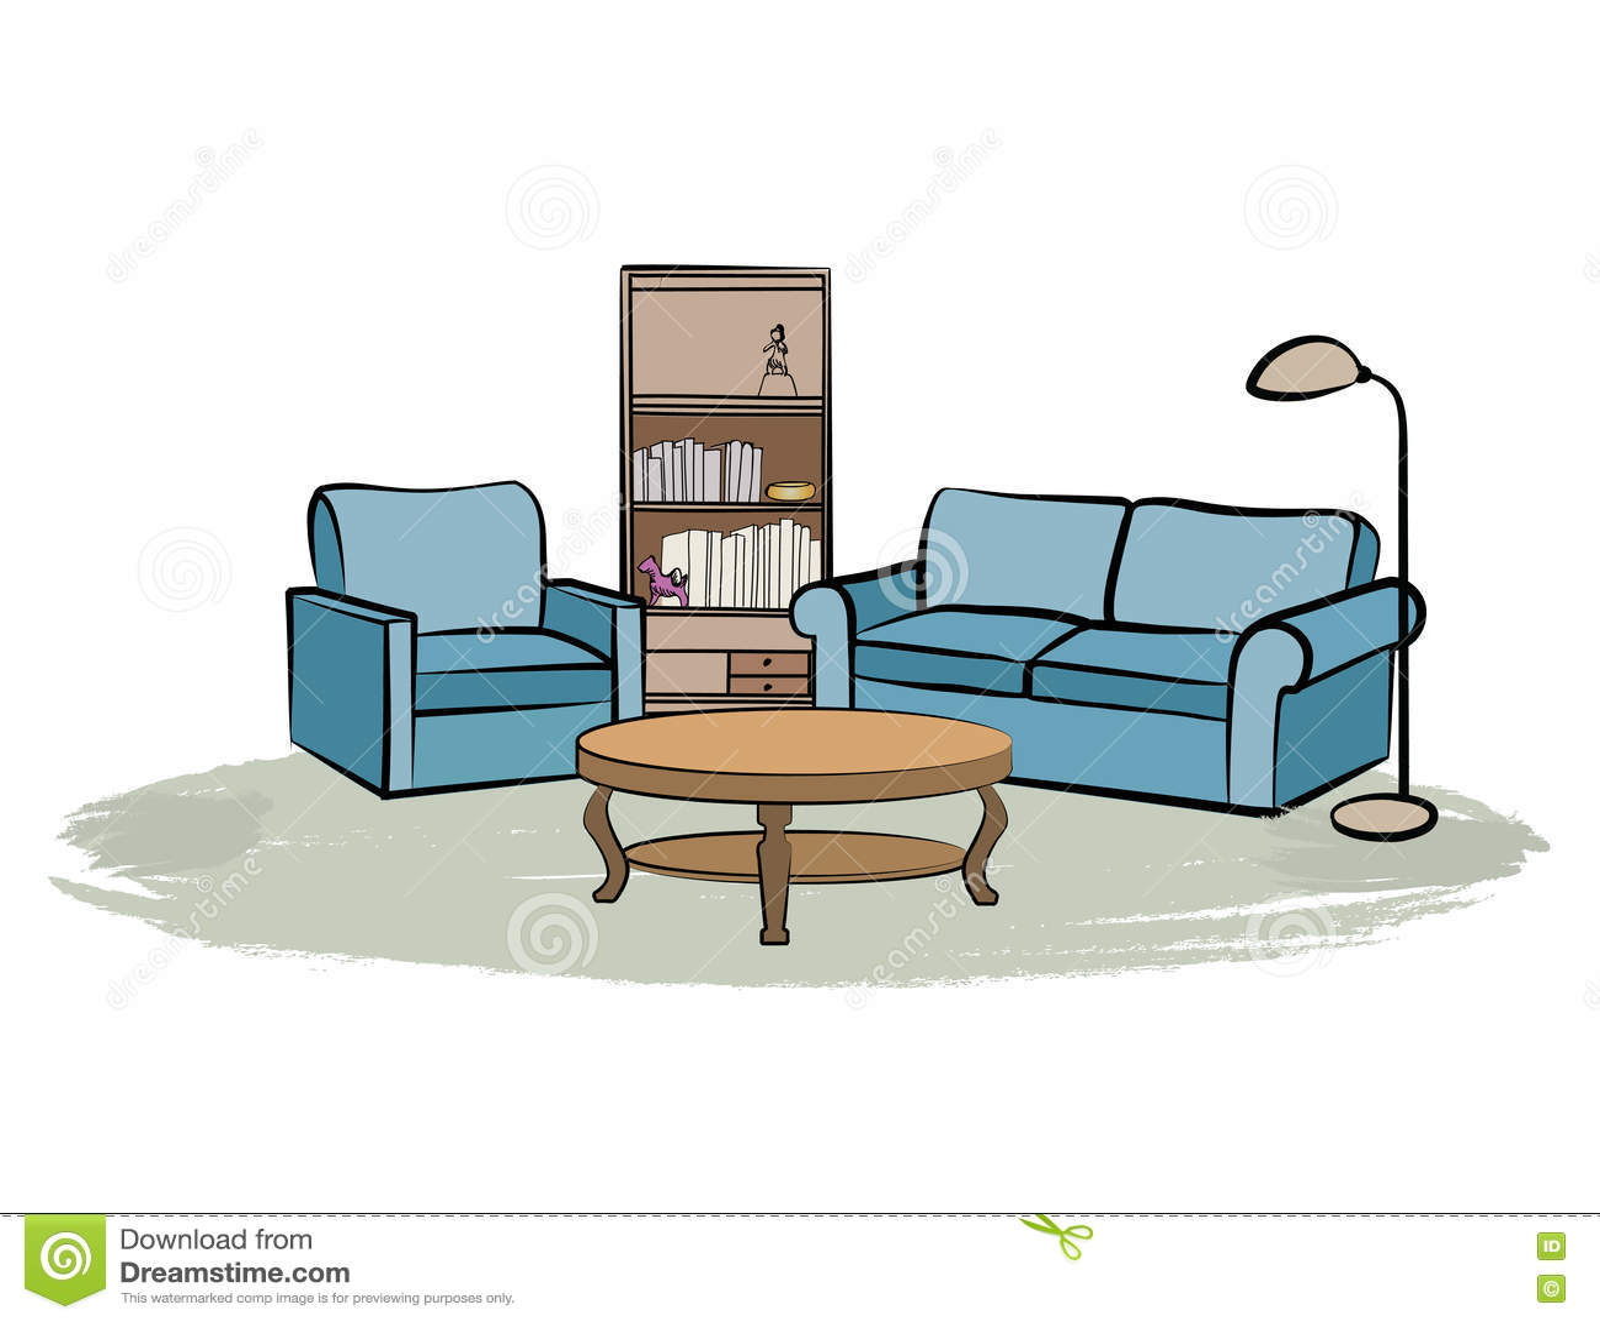 home interior furniture with sofa armchair table book shelf a armchair book books design drawing furniture home illustration interior